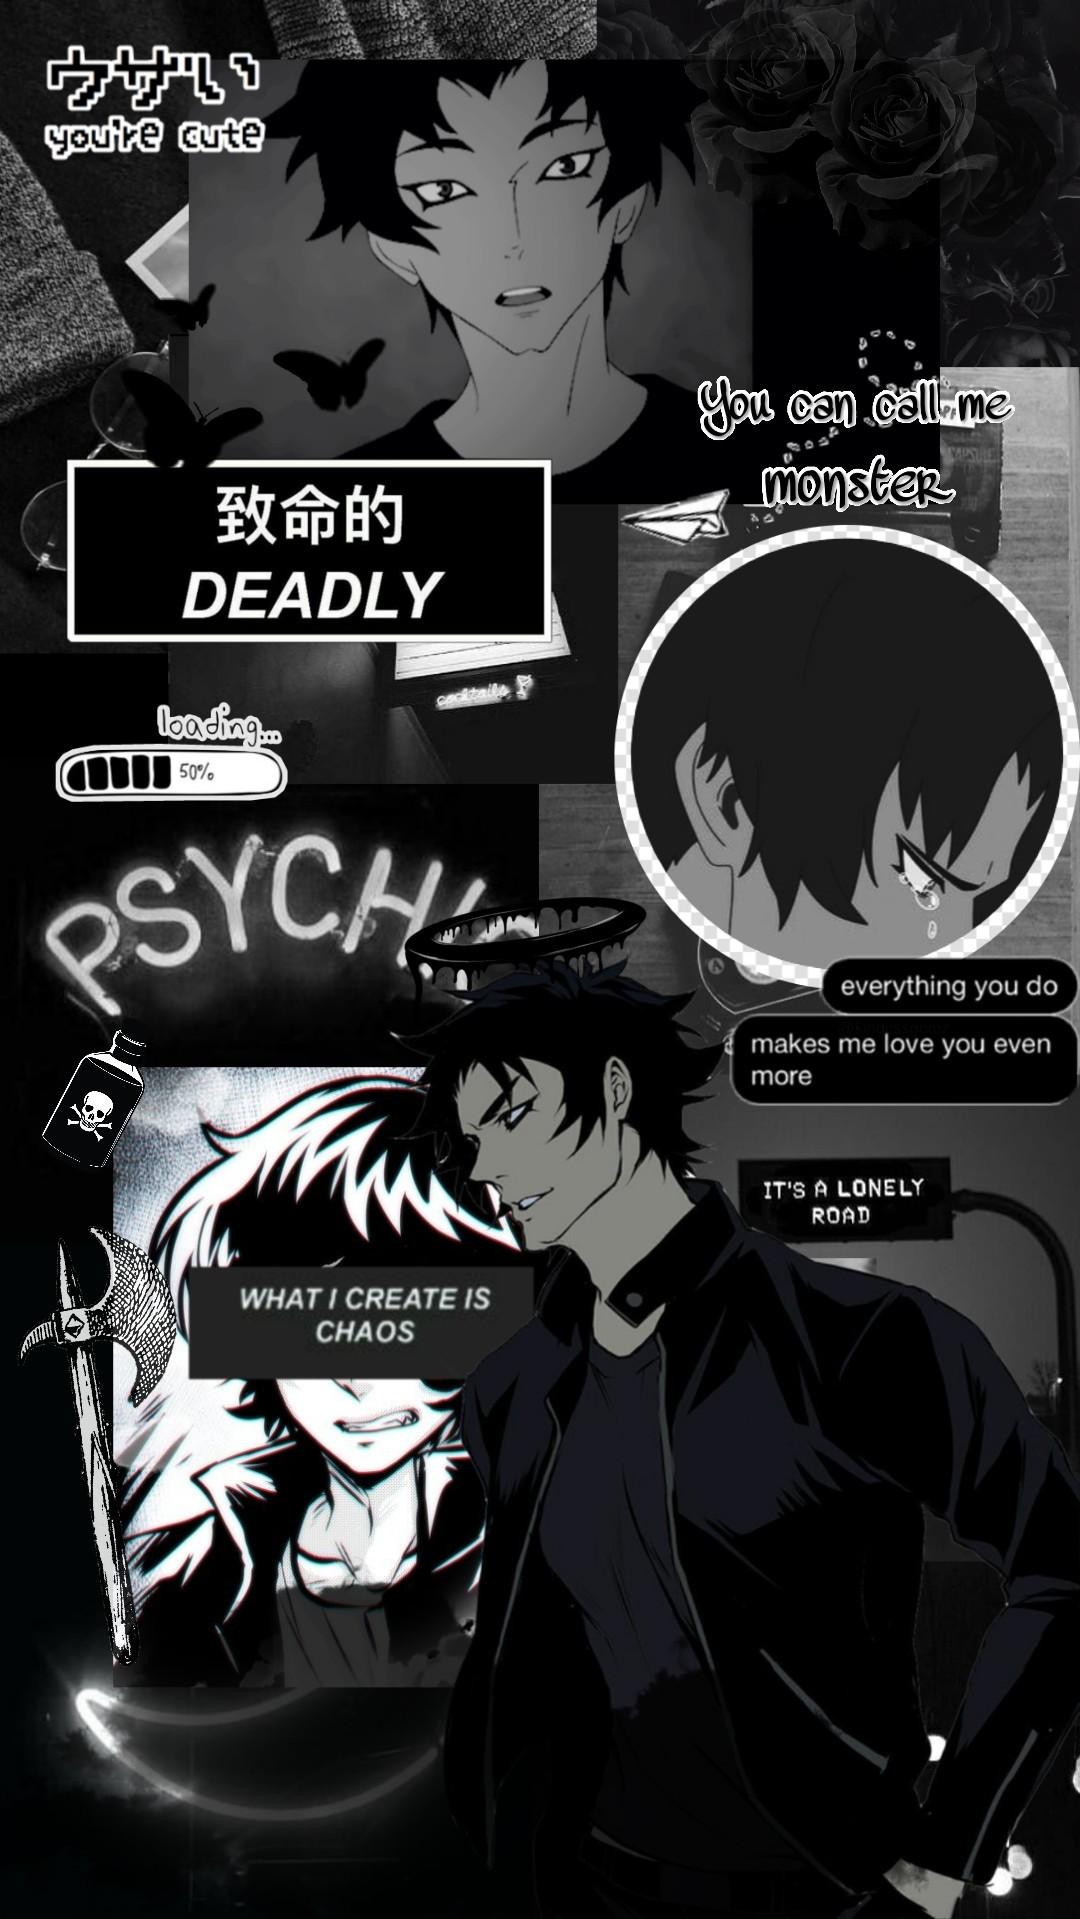 Wallpaper Akira Akirafudo Devilman Image By Gabs